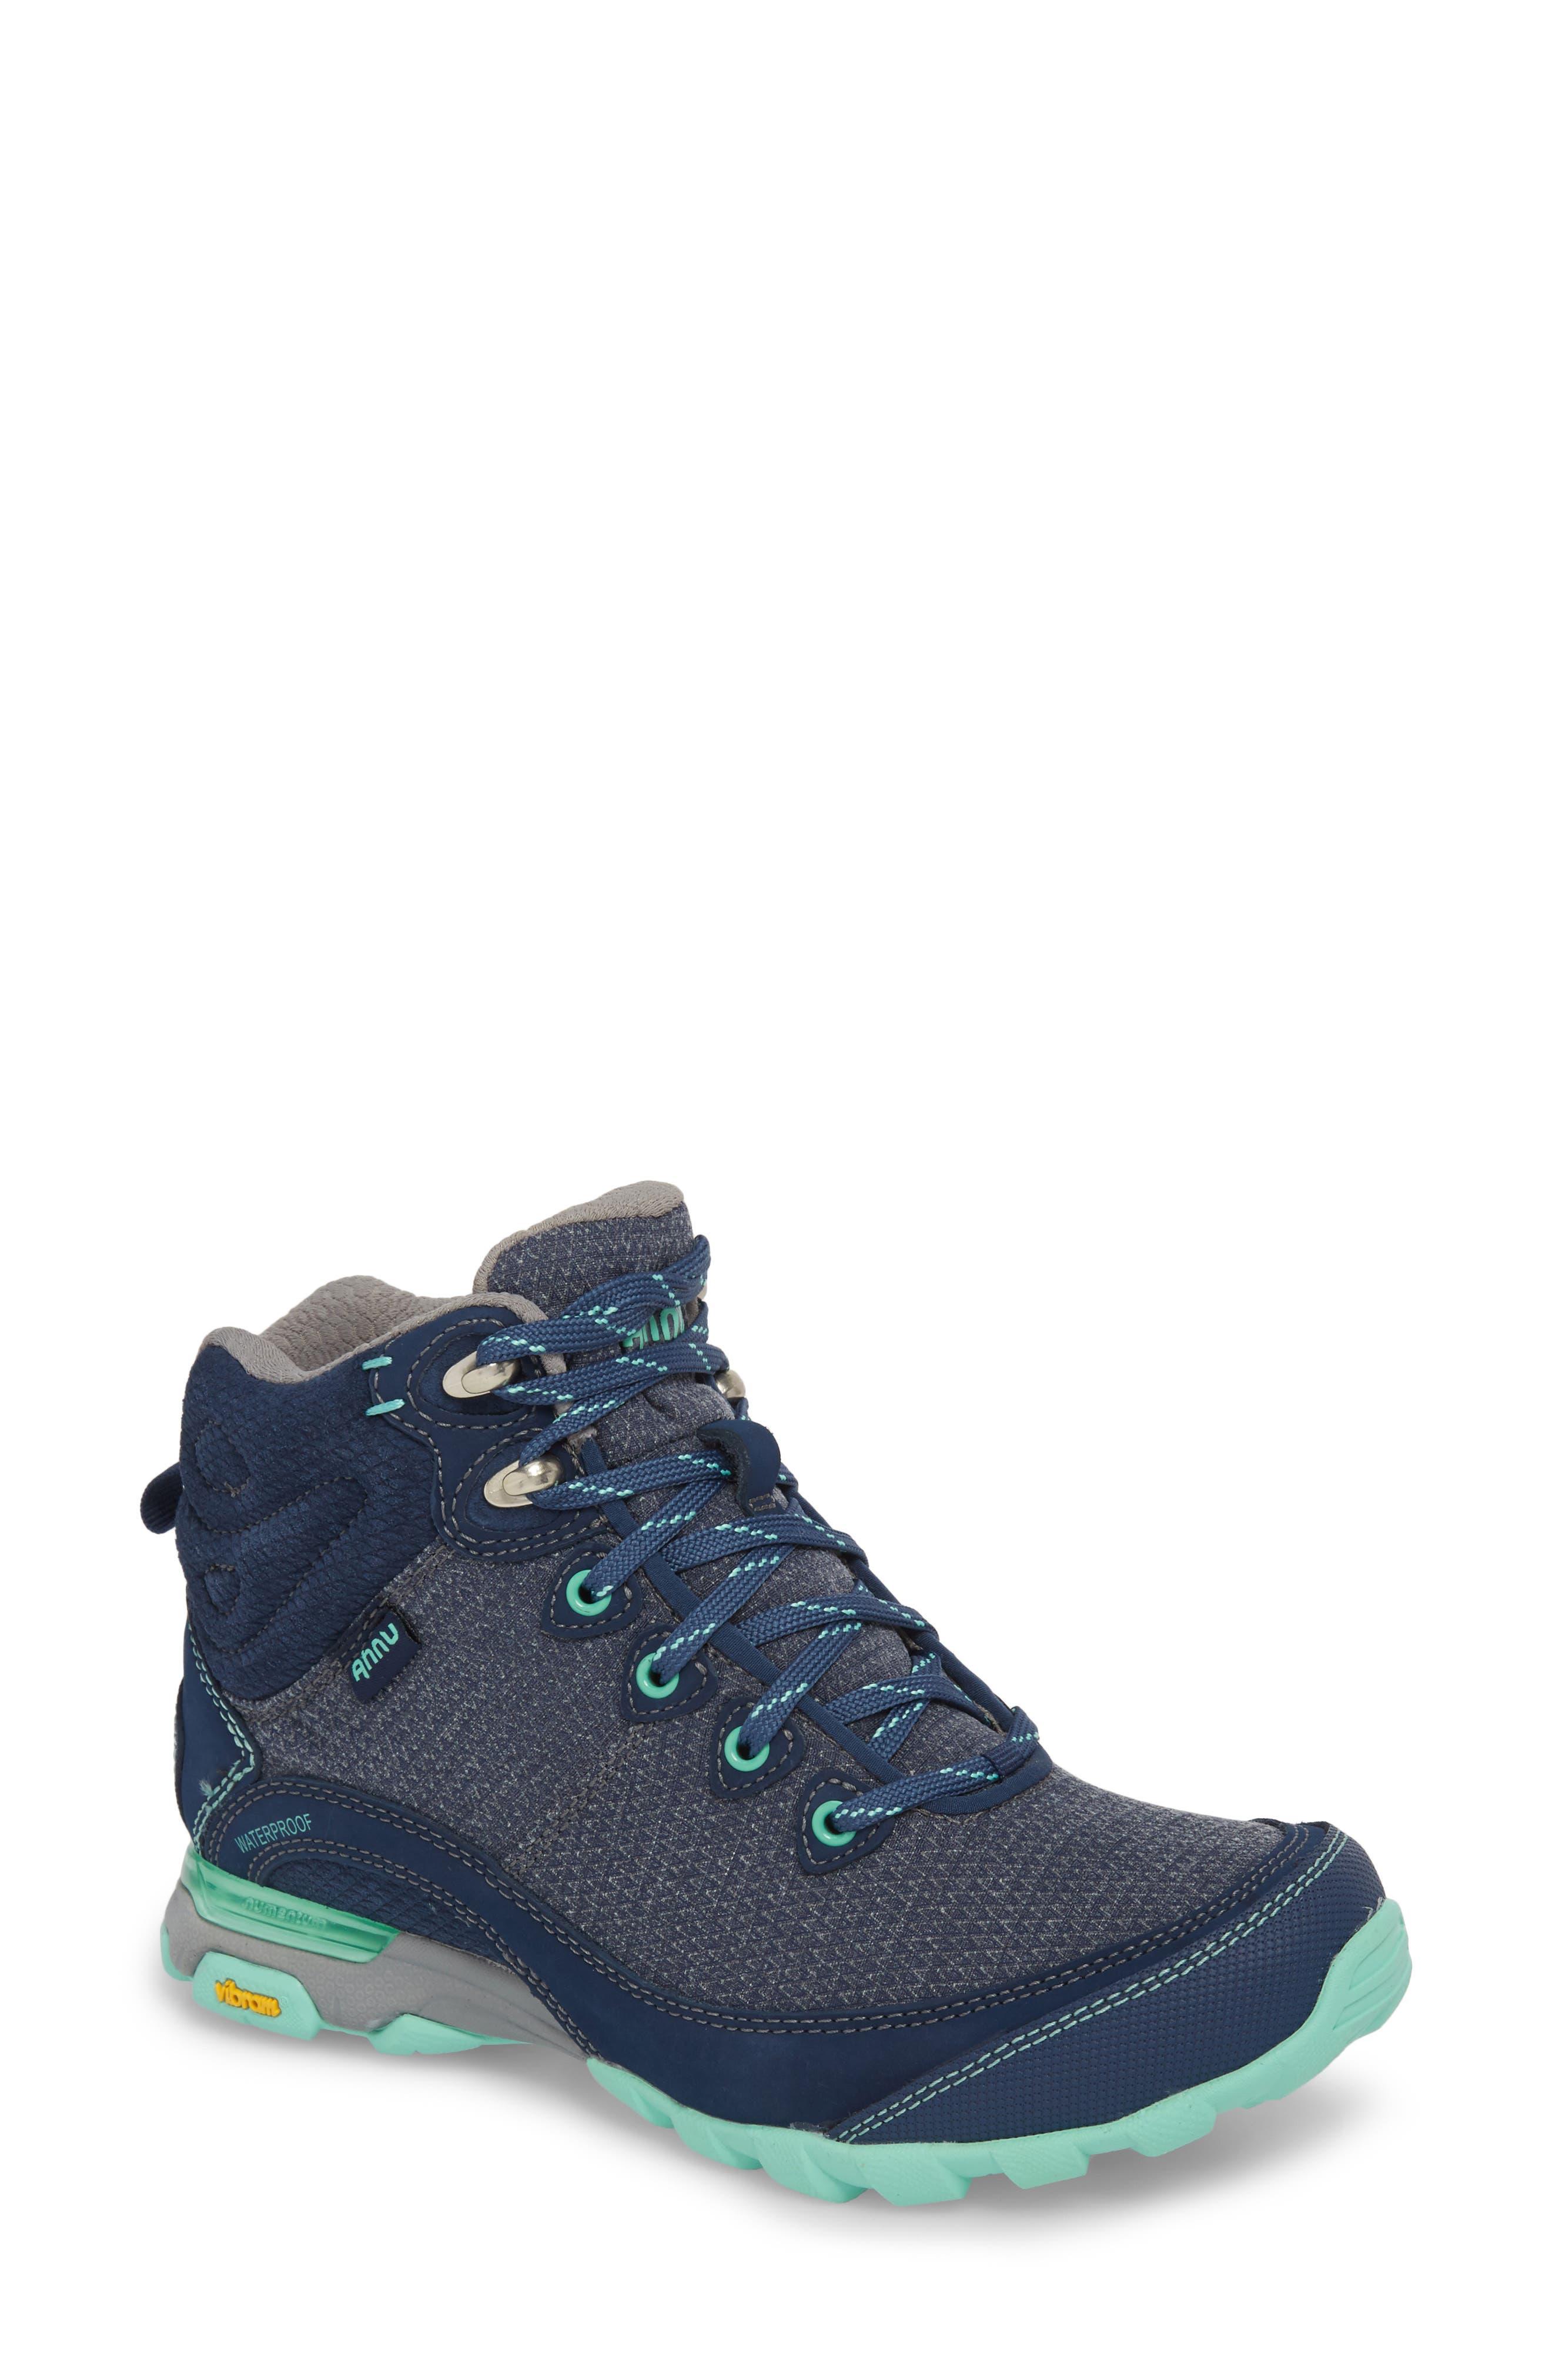 TEVA Ahnu by Teva Sugarpine II Waterproof Hiking Boot, Main, color, INSIGNIA BLUE